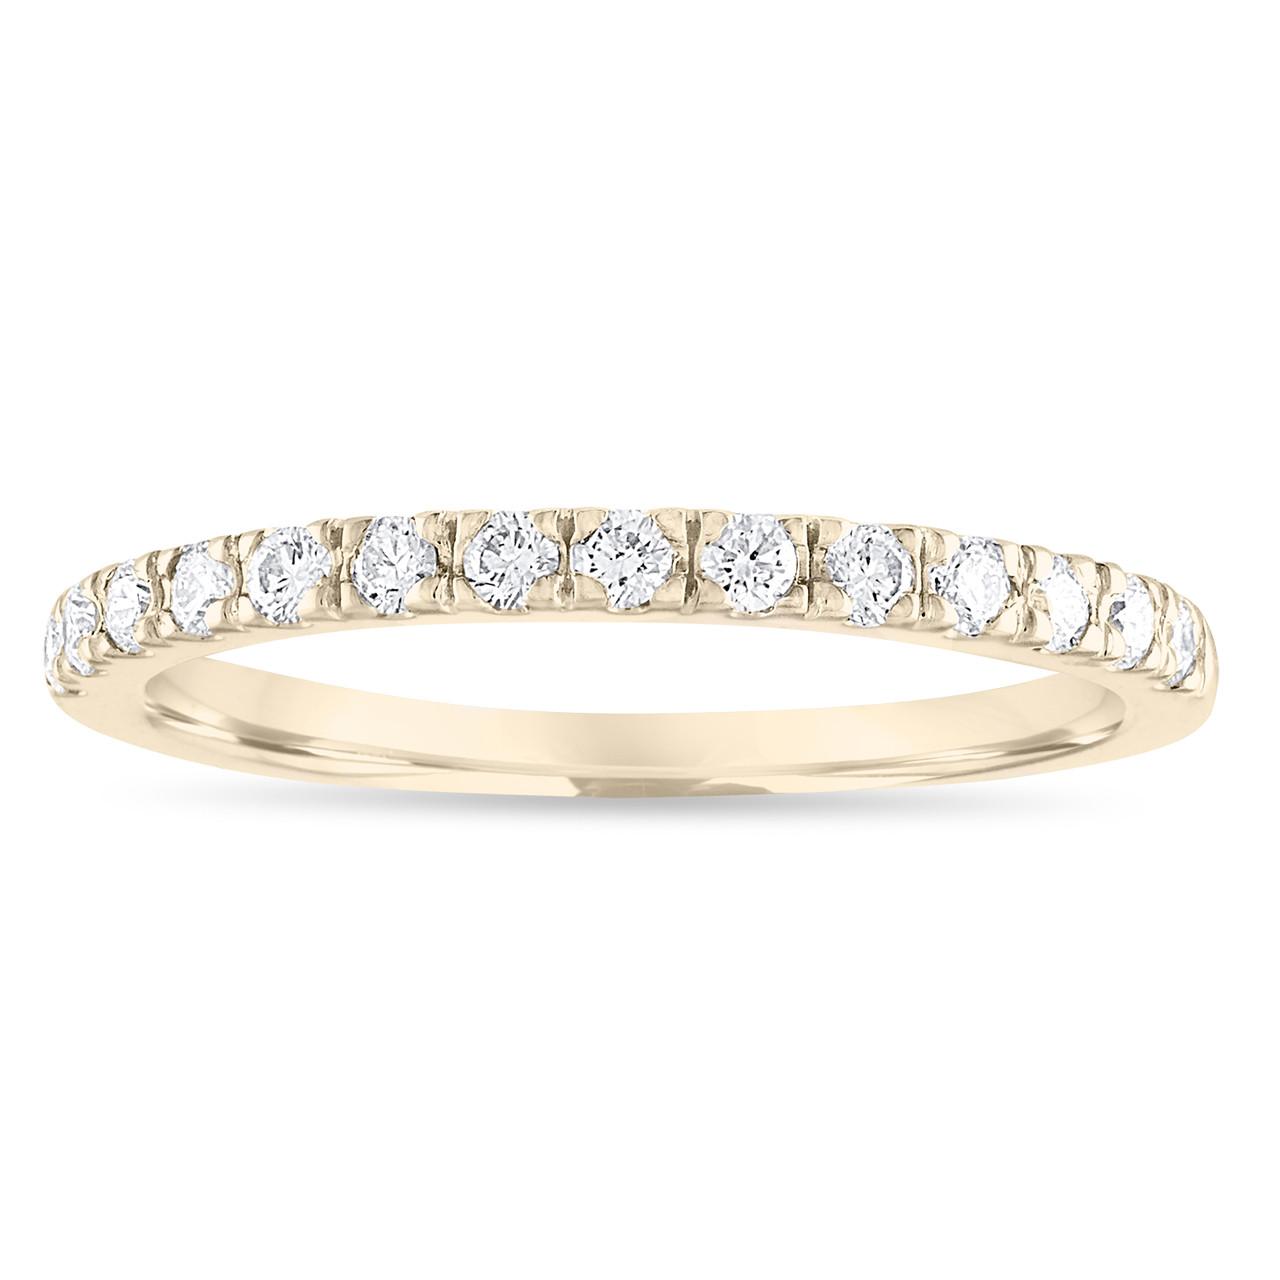 Gold Diamond Wedding Band Half Eternity Ring Yellow Anniversary Stackable F Vs2 0 28 Carat Handmade